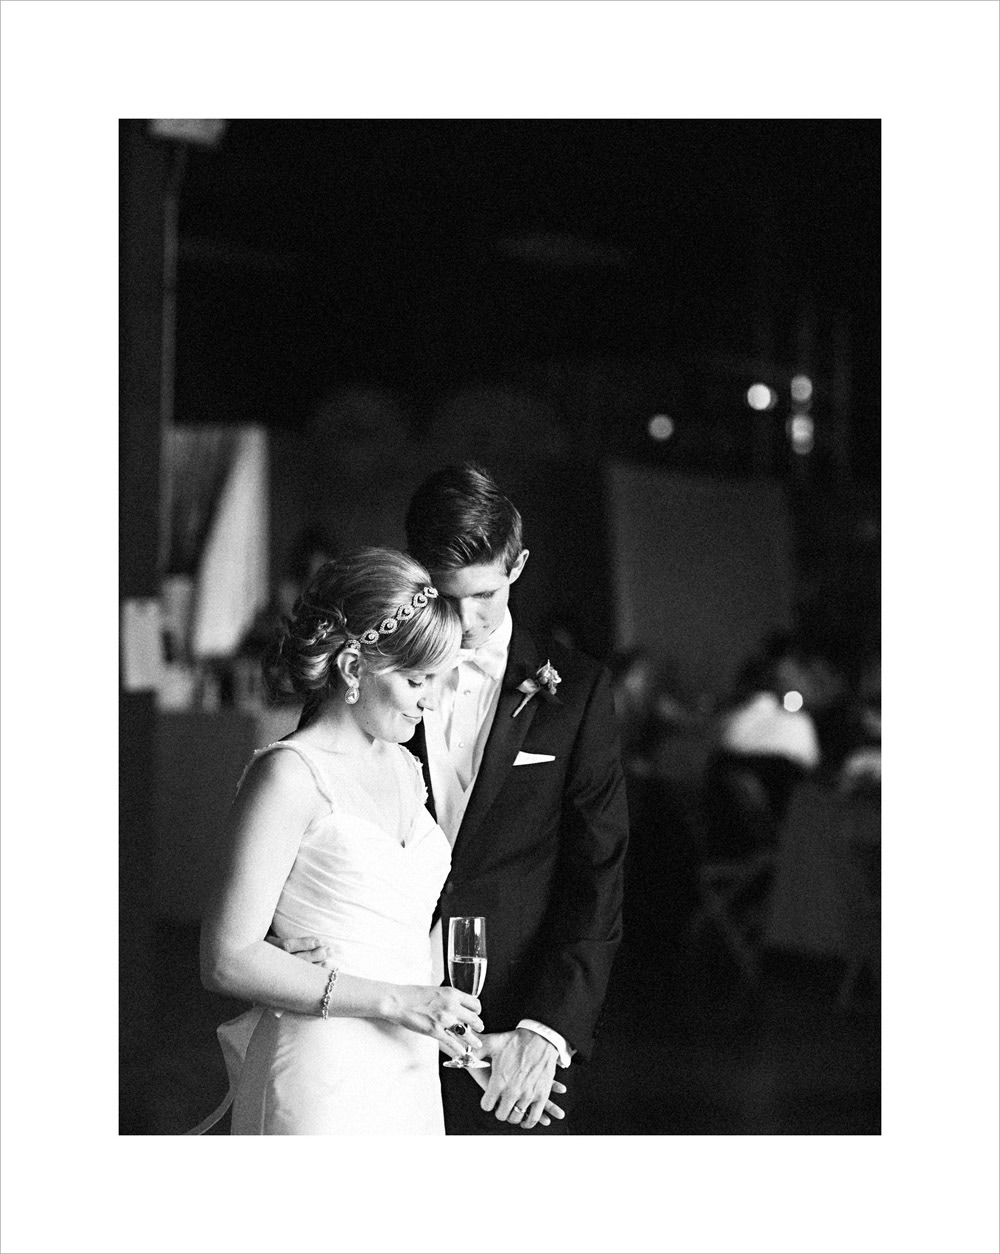 Eric-Yerke-Photography-2013-148.jpg